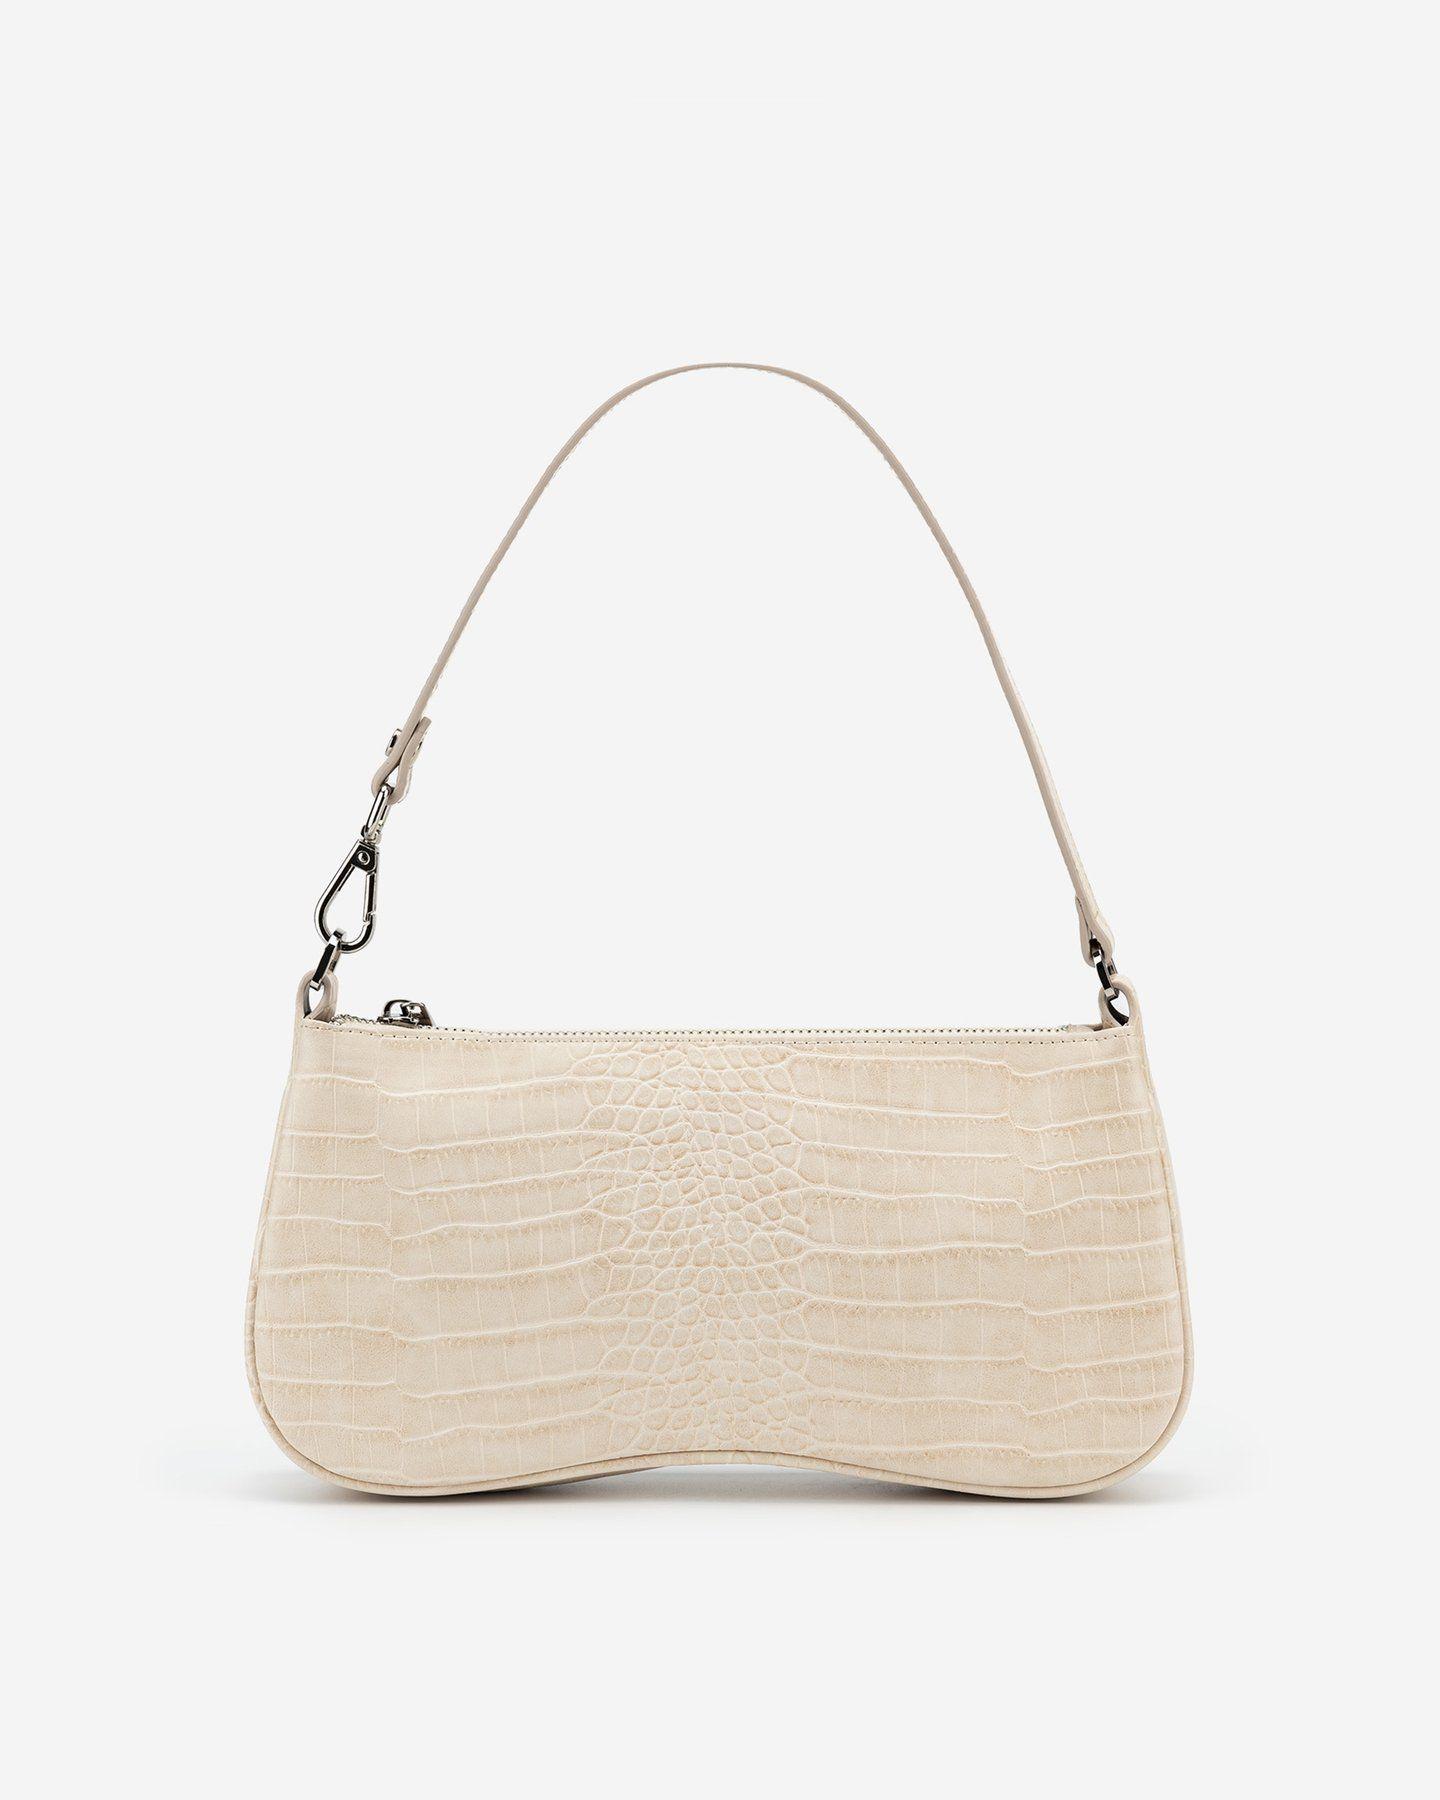 JW Pei Baguette Bag